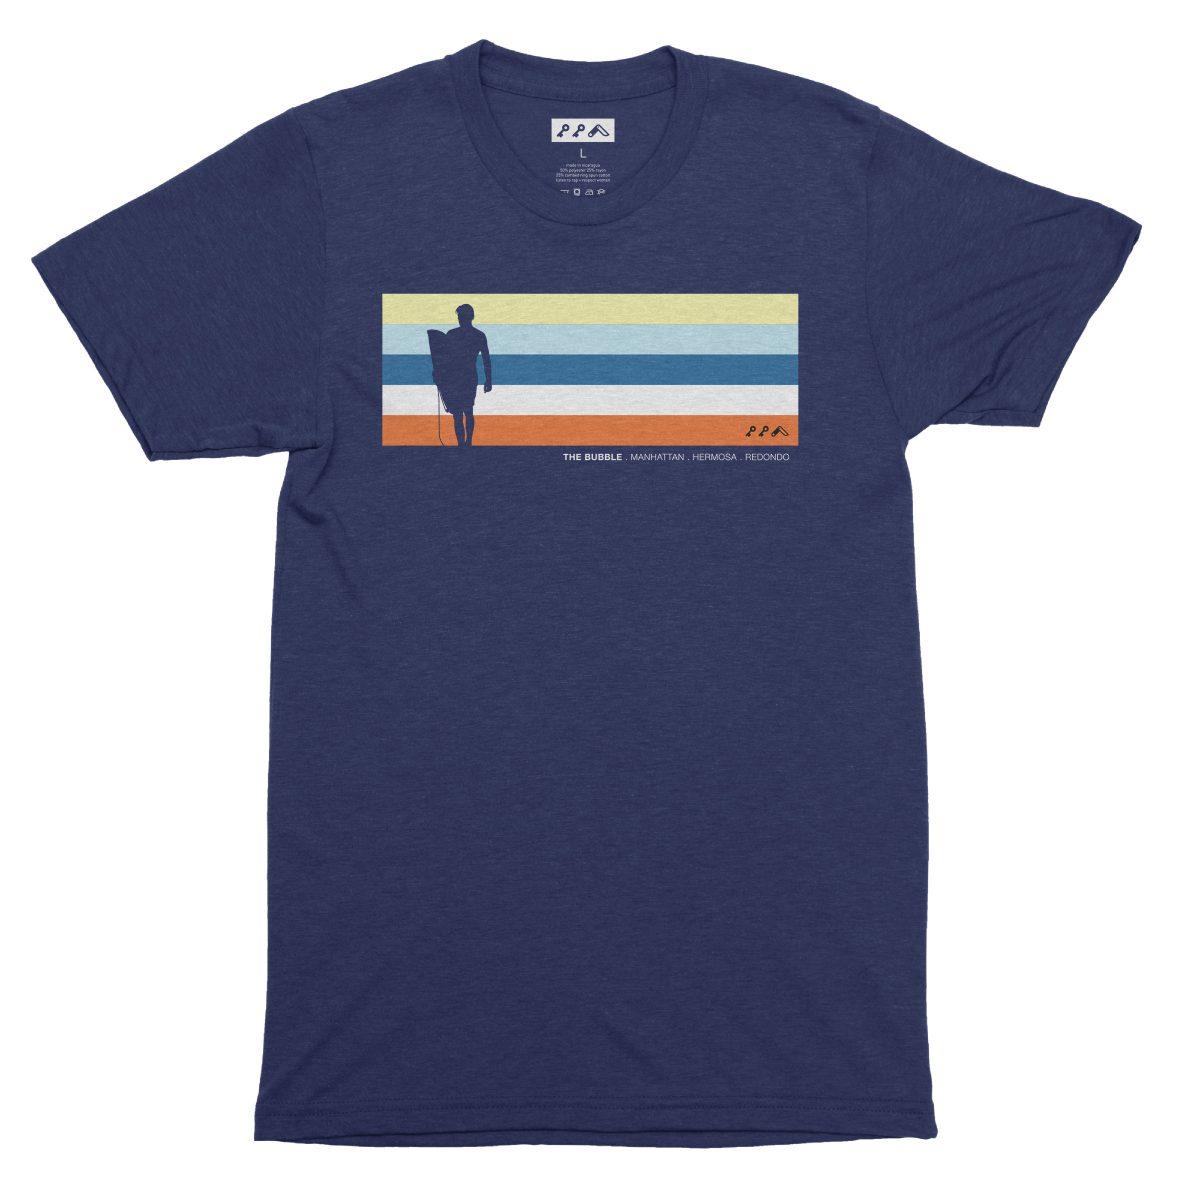 the bubble redondo hermosa manhattan beach shirts in navy blue by kikicutt surfer shirt store